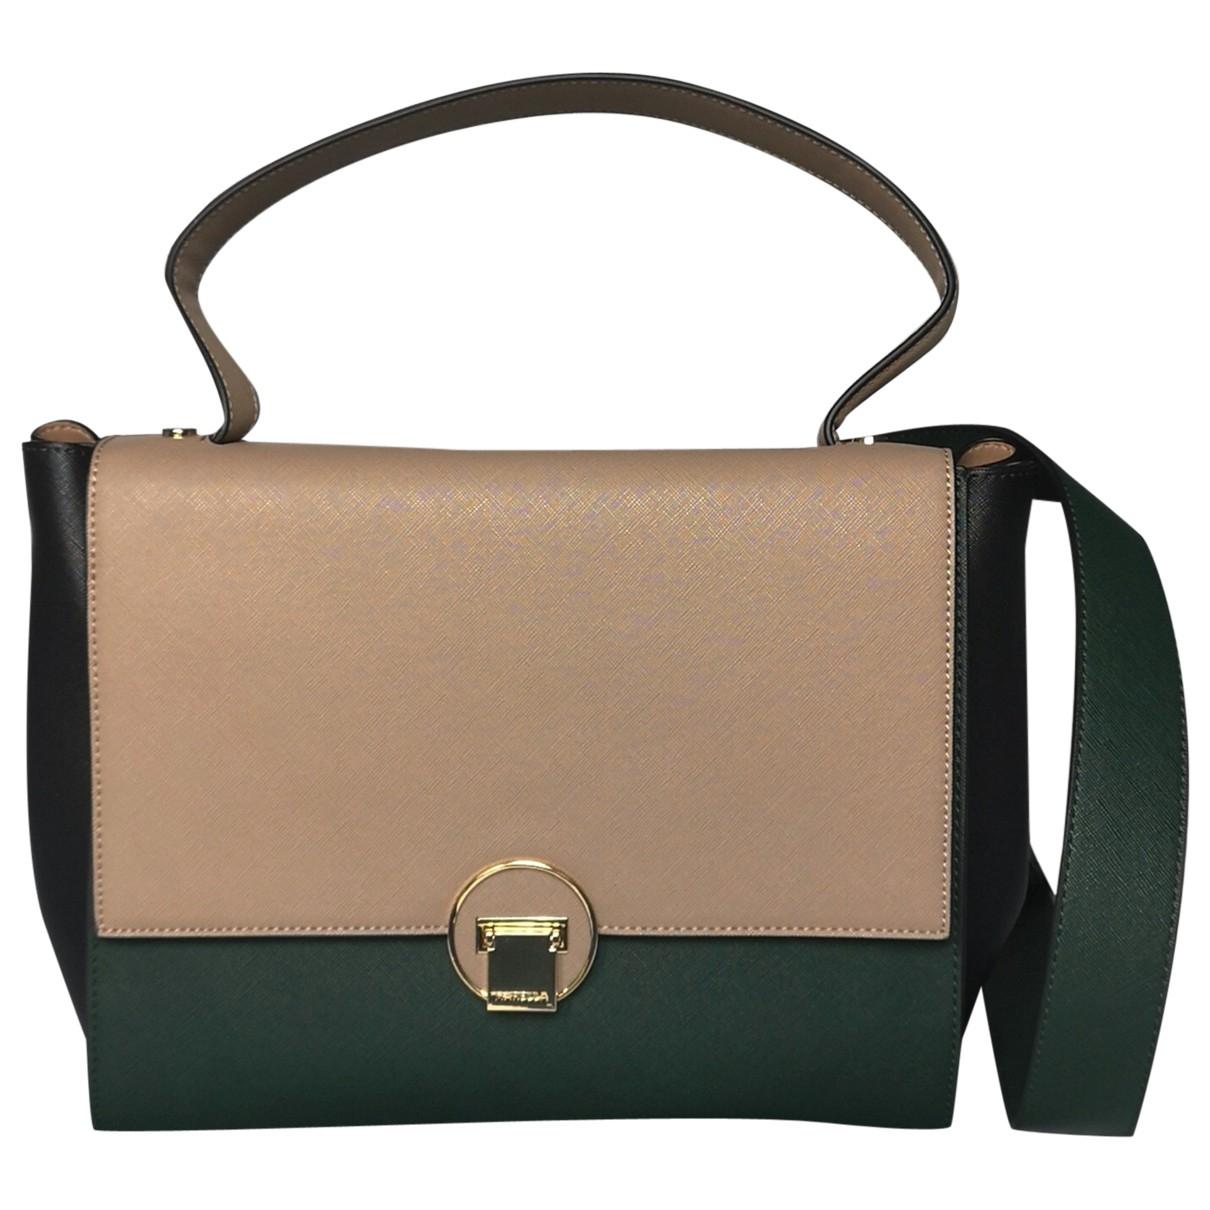 Marella \N Multicolour Leather handbag for Women \N